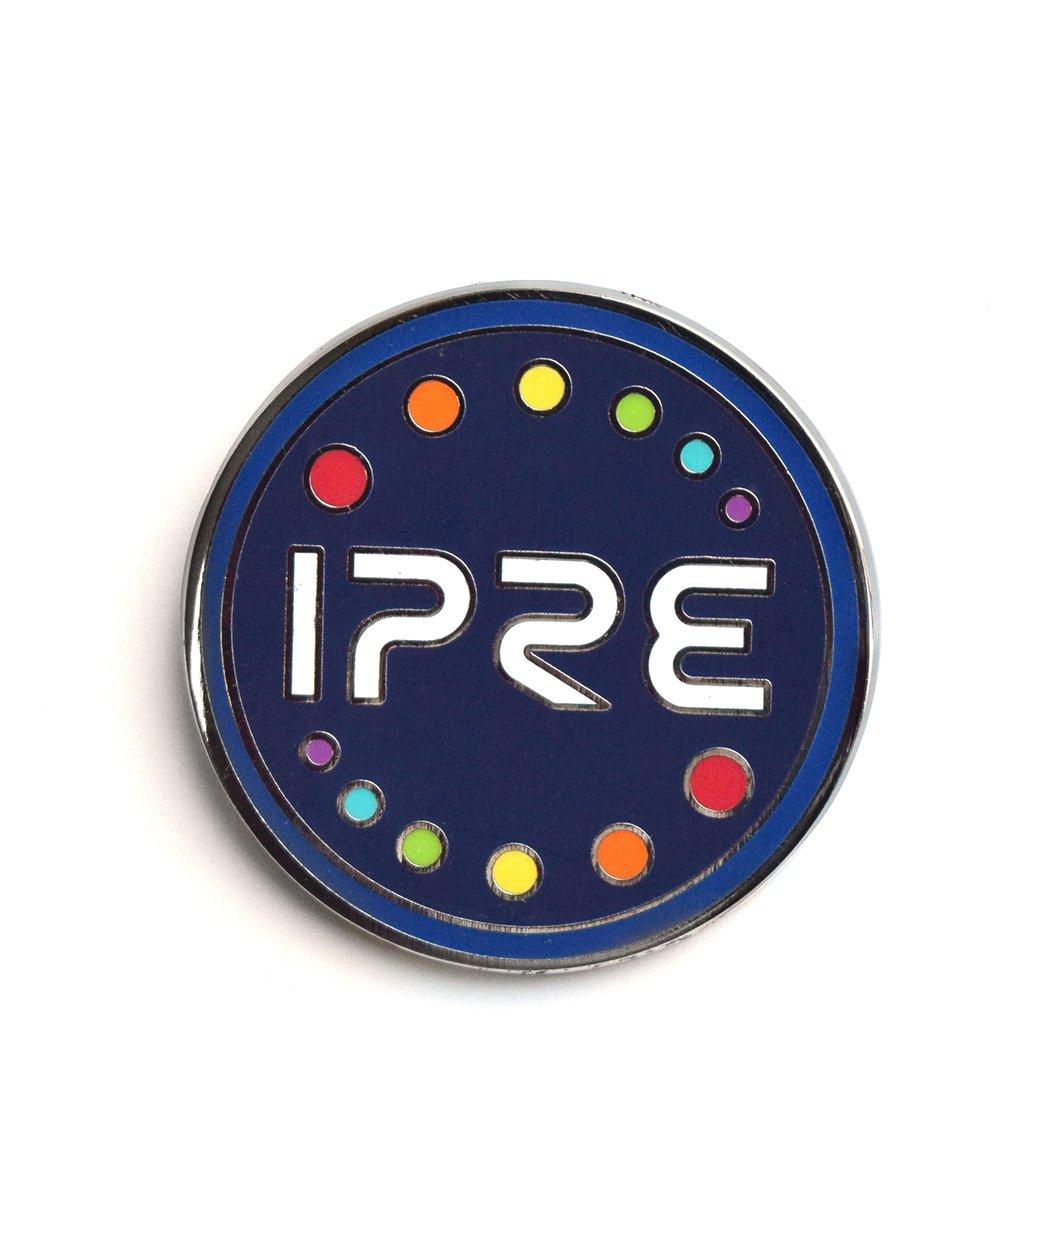 IPRE Enamel Pin.